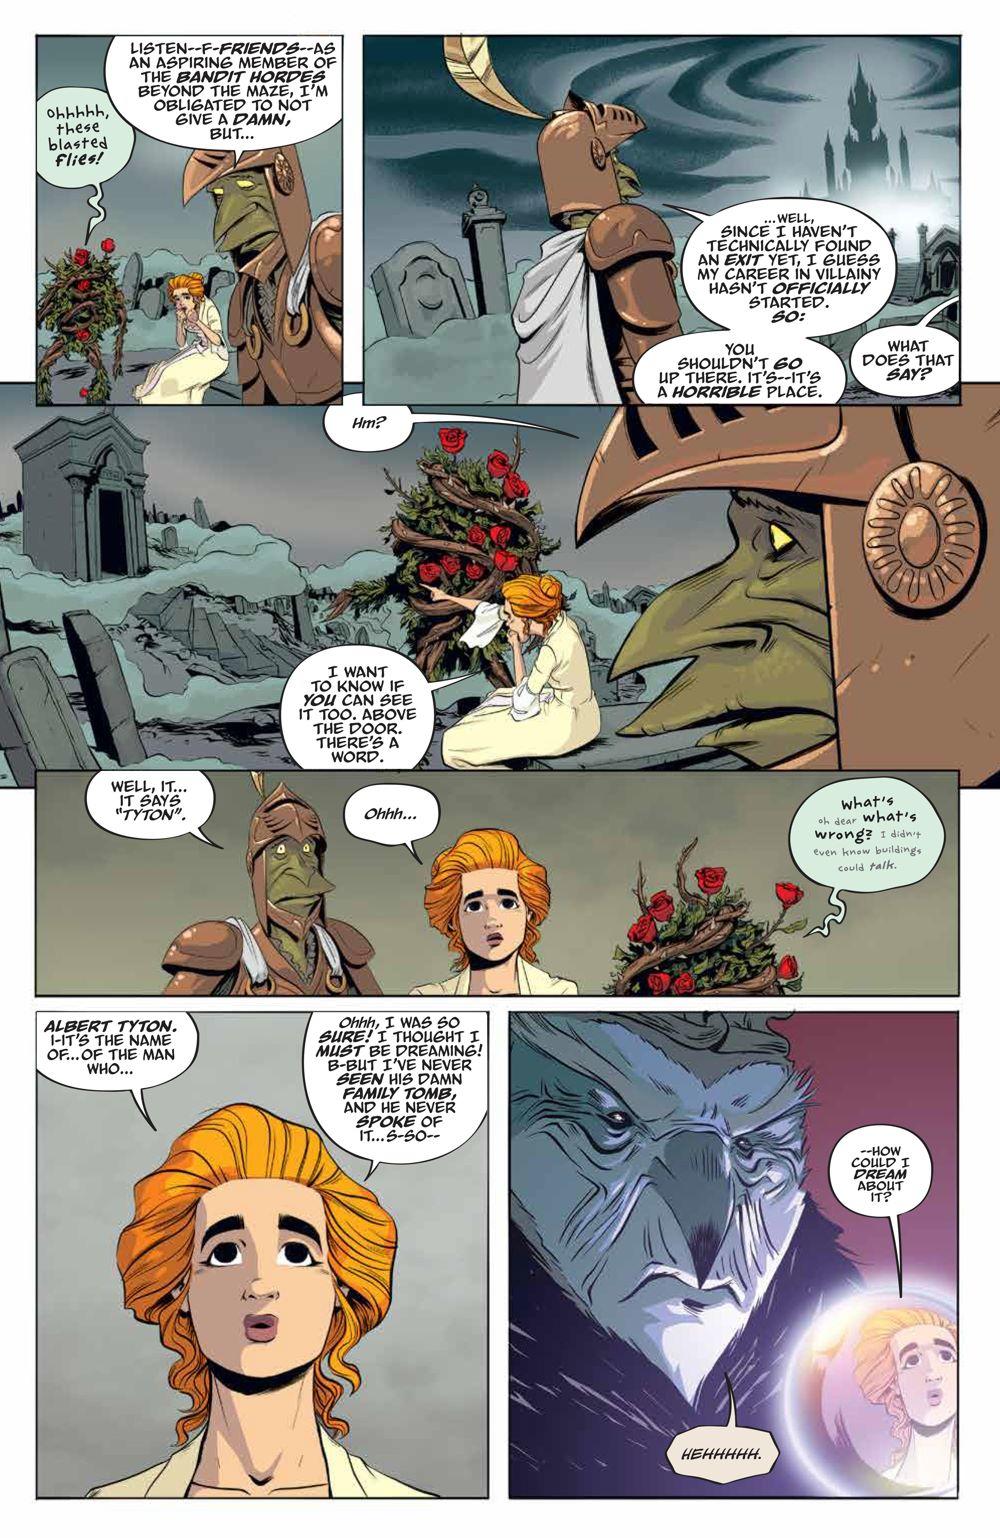 LabyrinthCoronation_v2_SC_PRESS_15 ComicList Previews: JIM HENSON'S LABYRINTH CORONATION VOLUME 2 TP